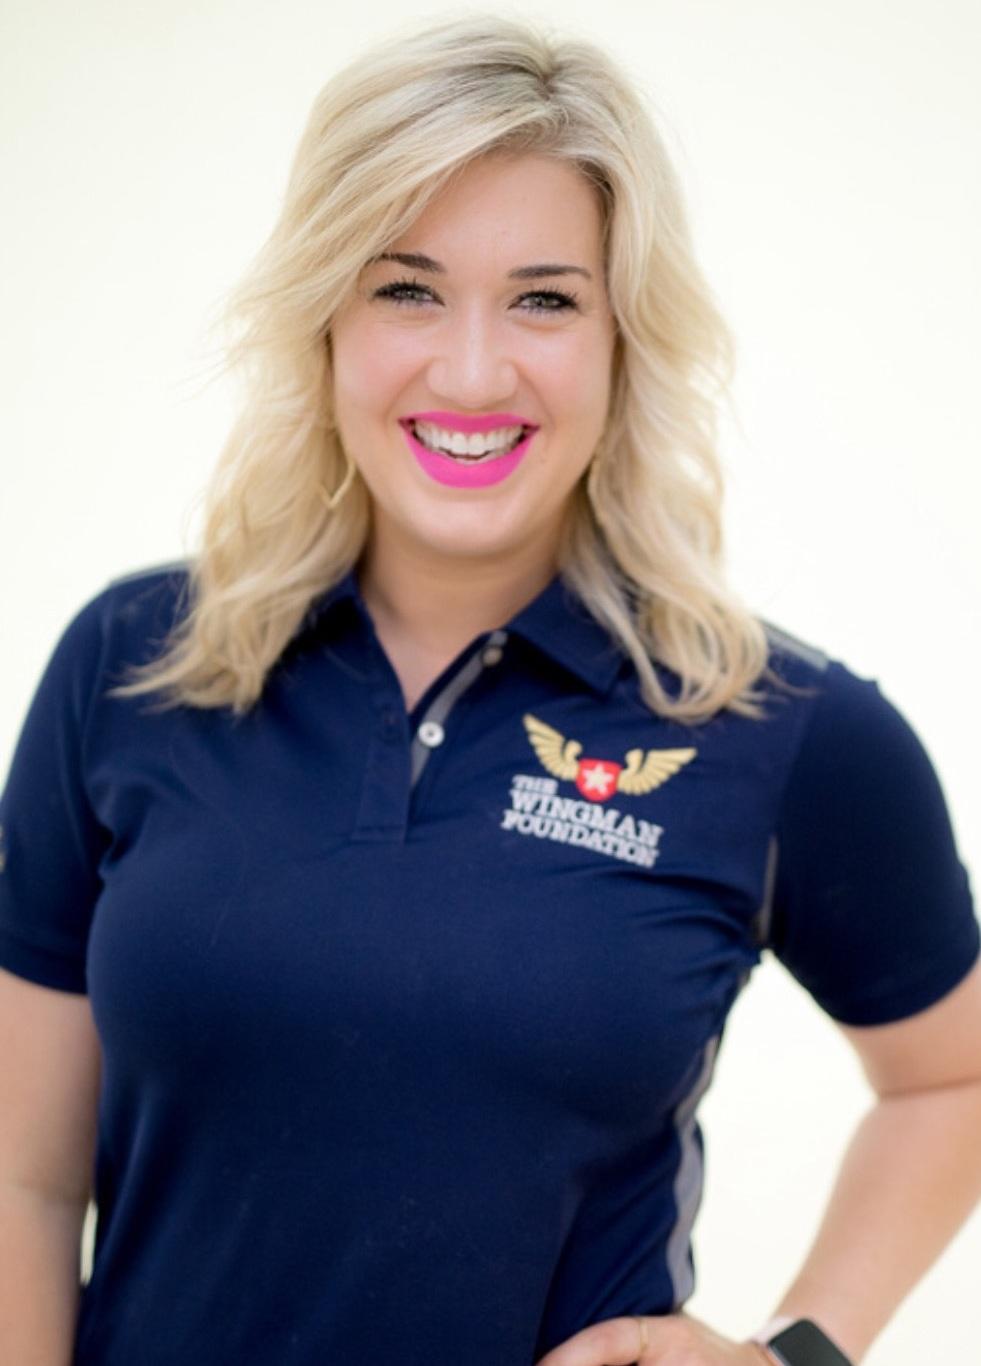 Kiley Frederick | Head of Communications